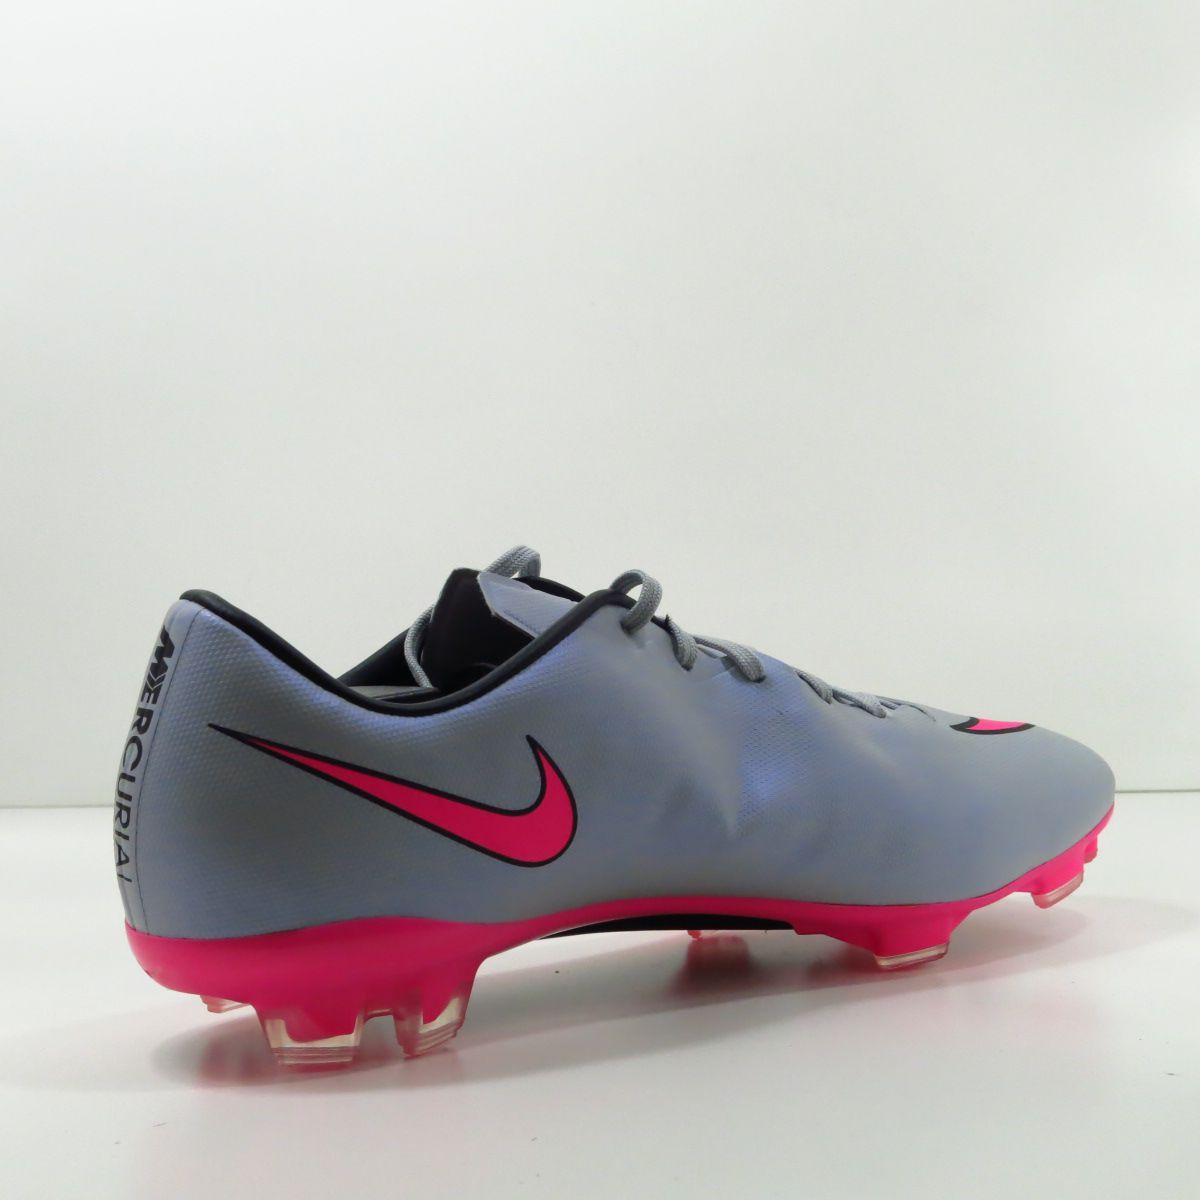 Chuteira Nike Mercurial Veloce FG